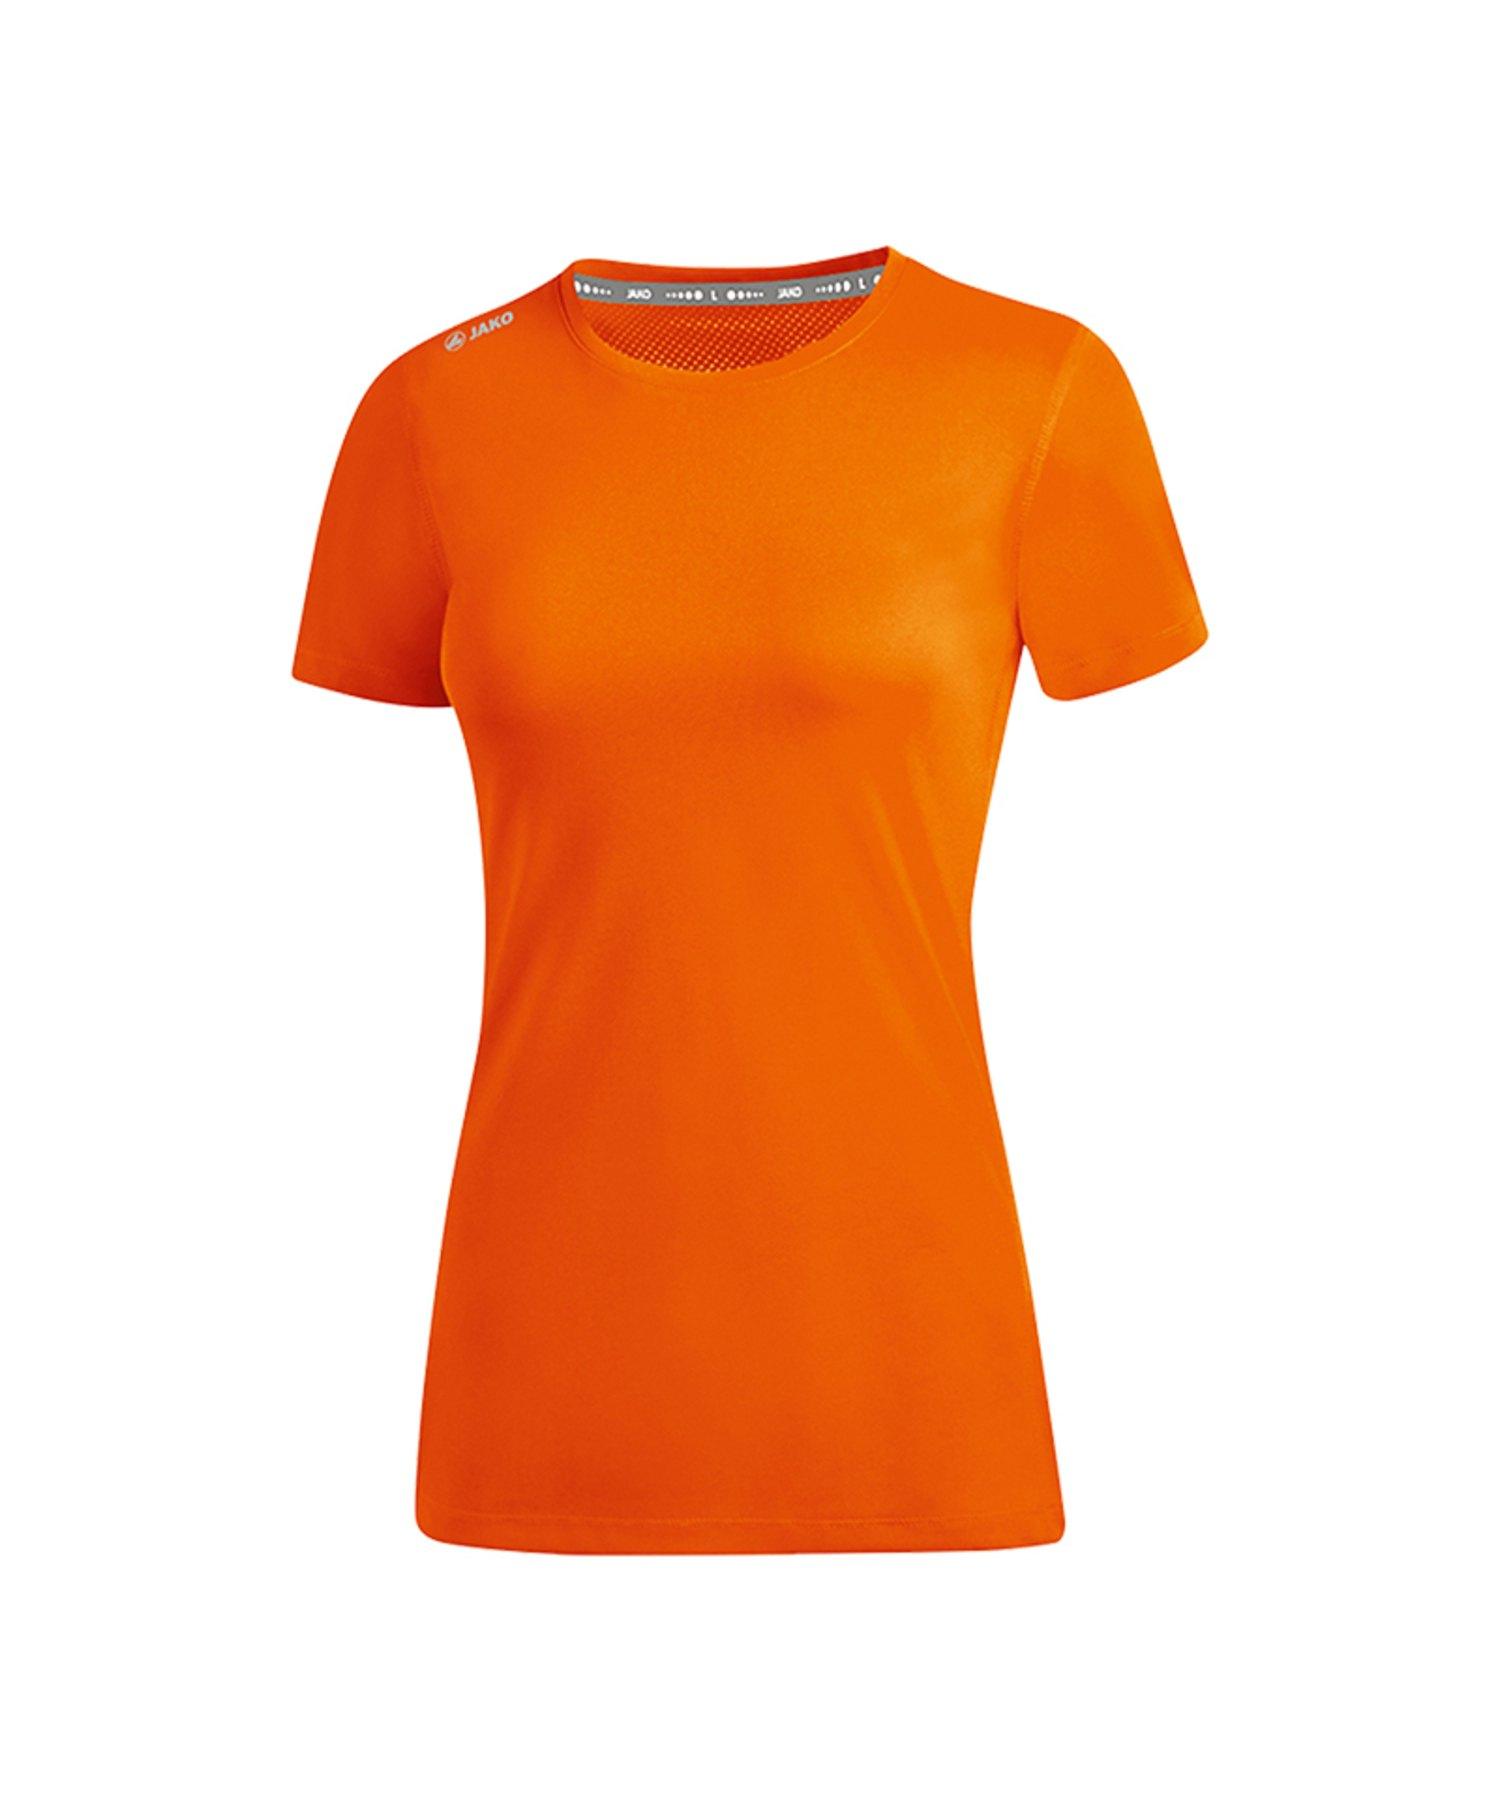 Jako Run 2.0 T-Shirt Running Damen Orange F19 - Orange